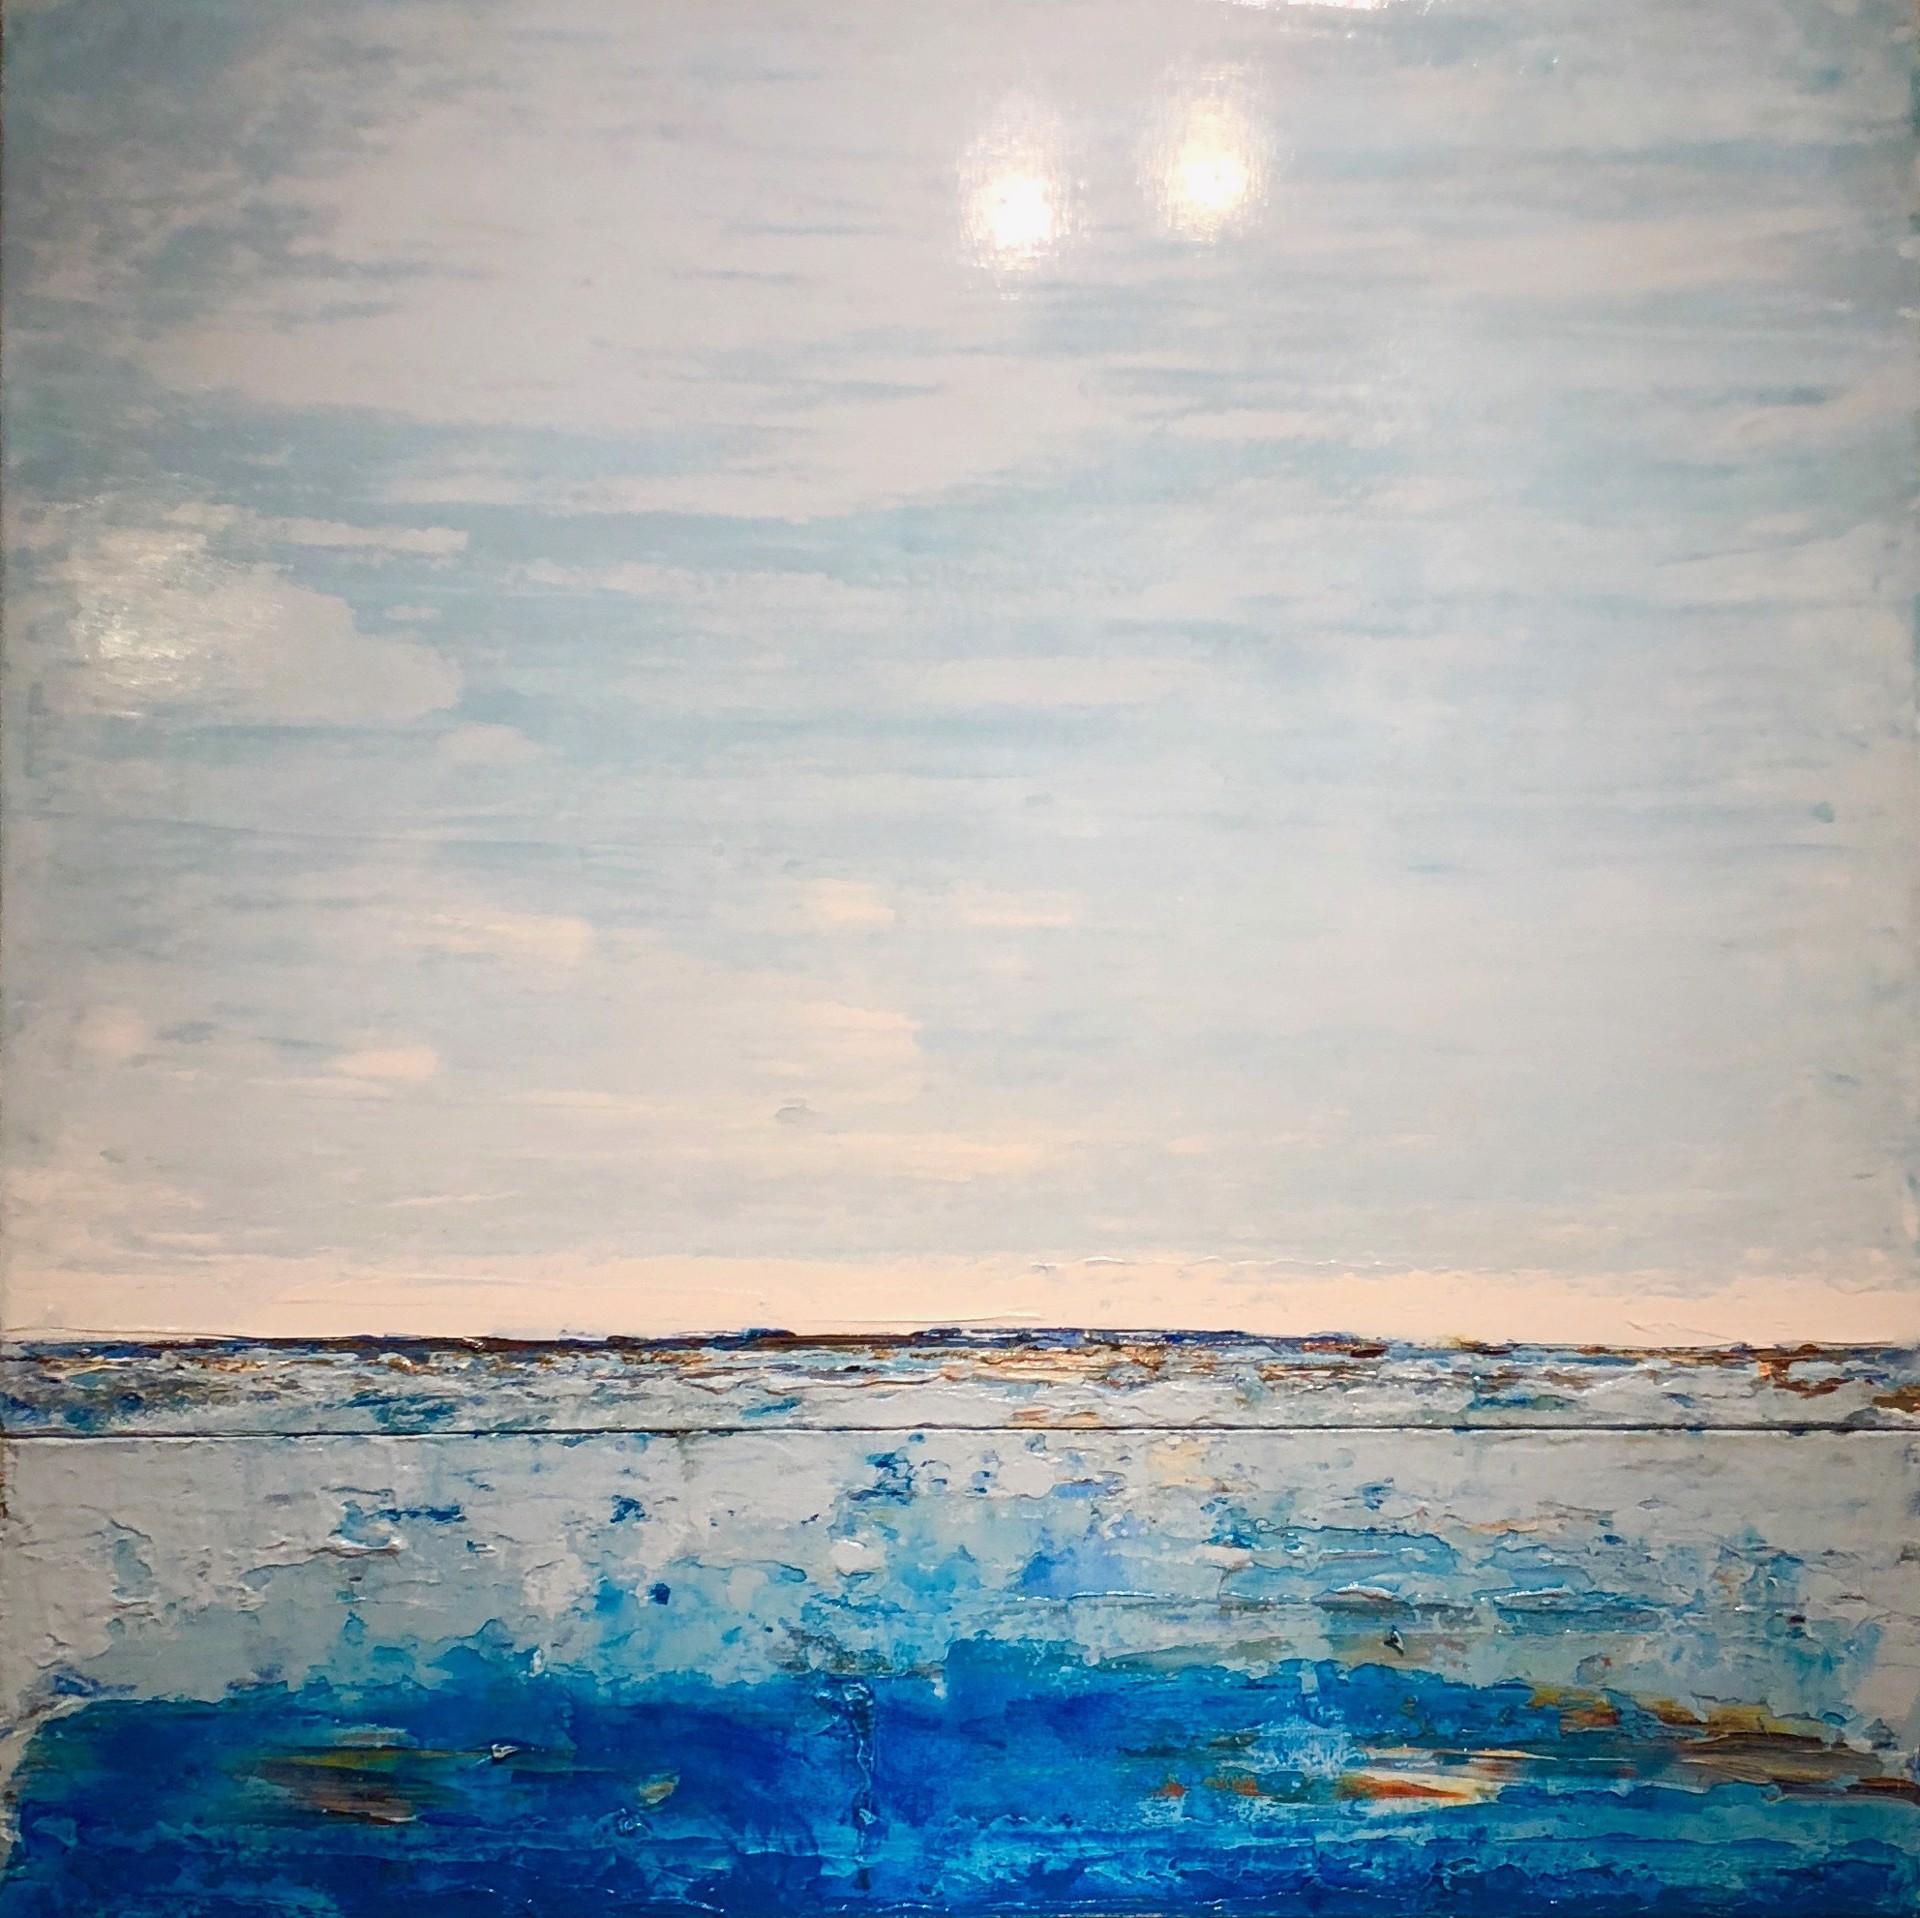 Atlantico #1 by John Schuyler